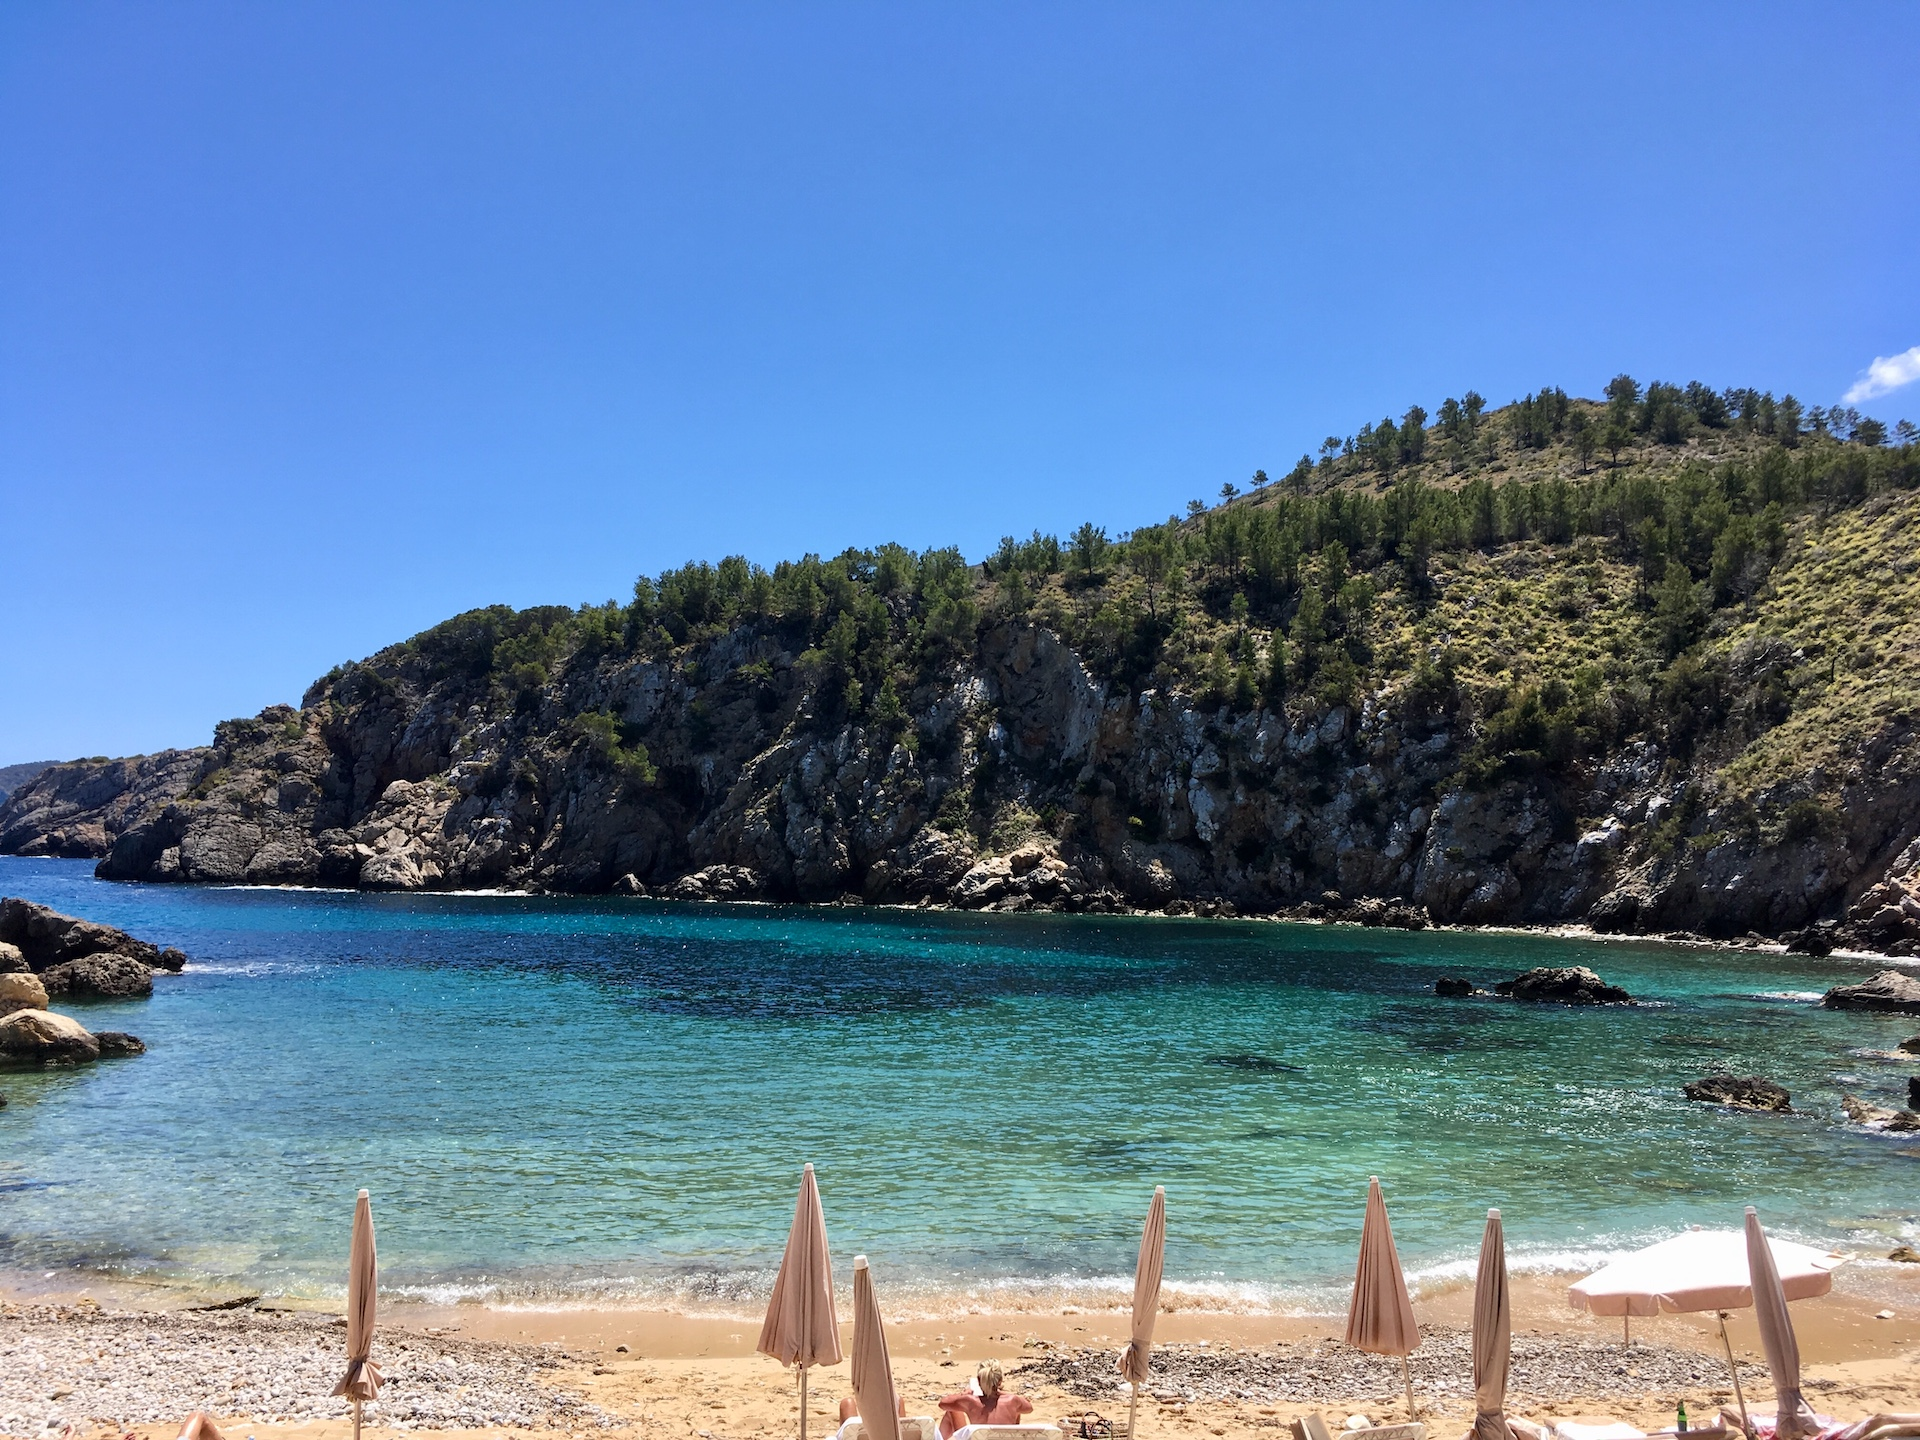 Cala d'en Serra - wunderschöne Natur-Bucht in Ibizas Norden #Ibiza #Urlaub #Strand #Geheimtipp #Schnorcheln #Kajak #SUP